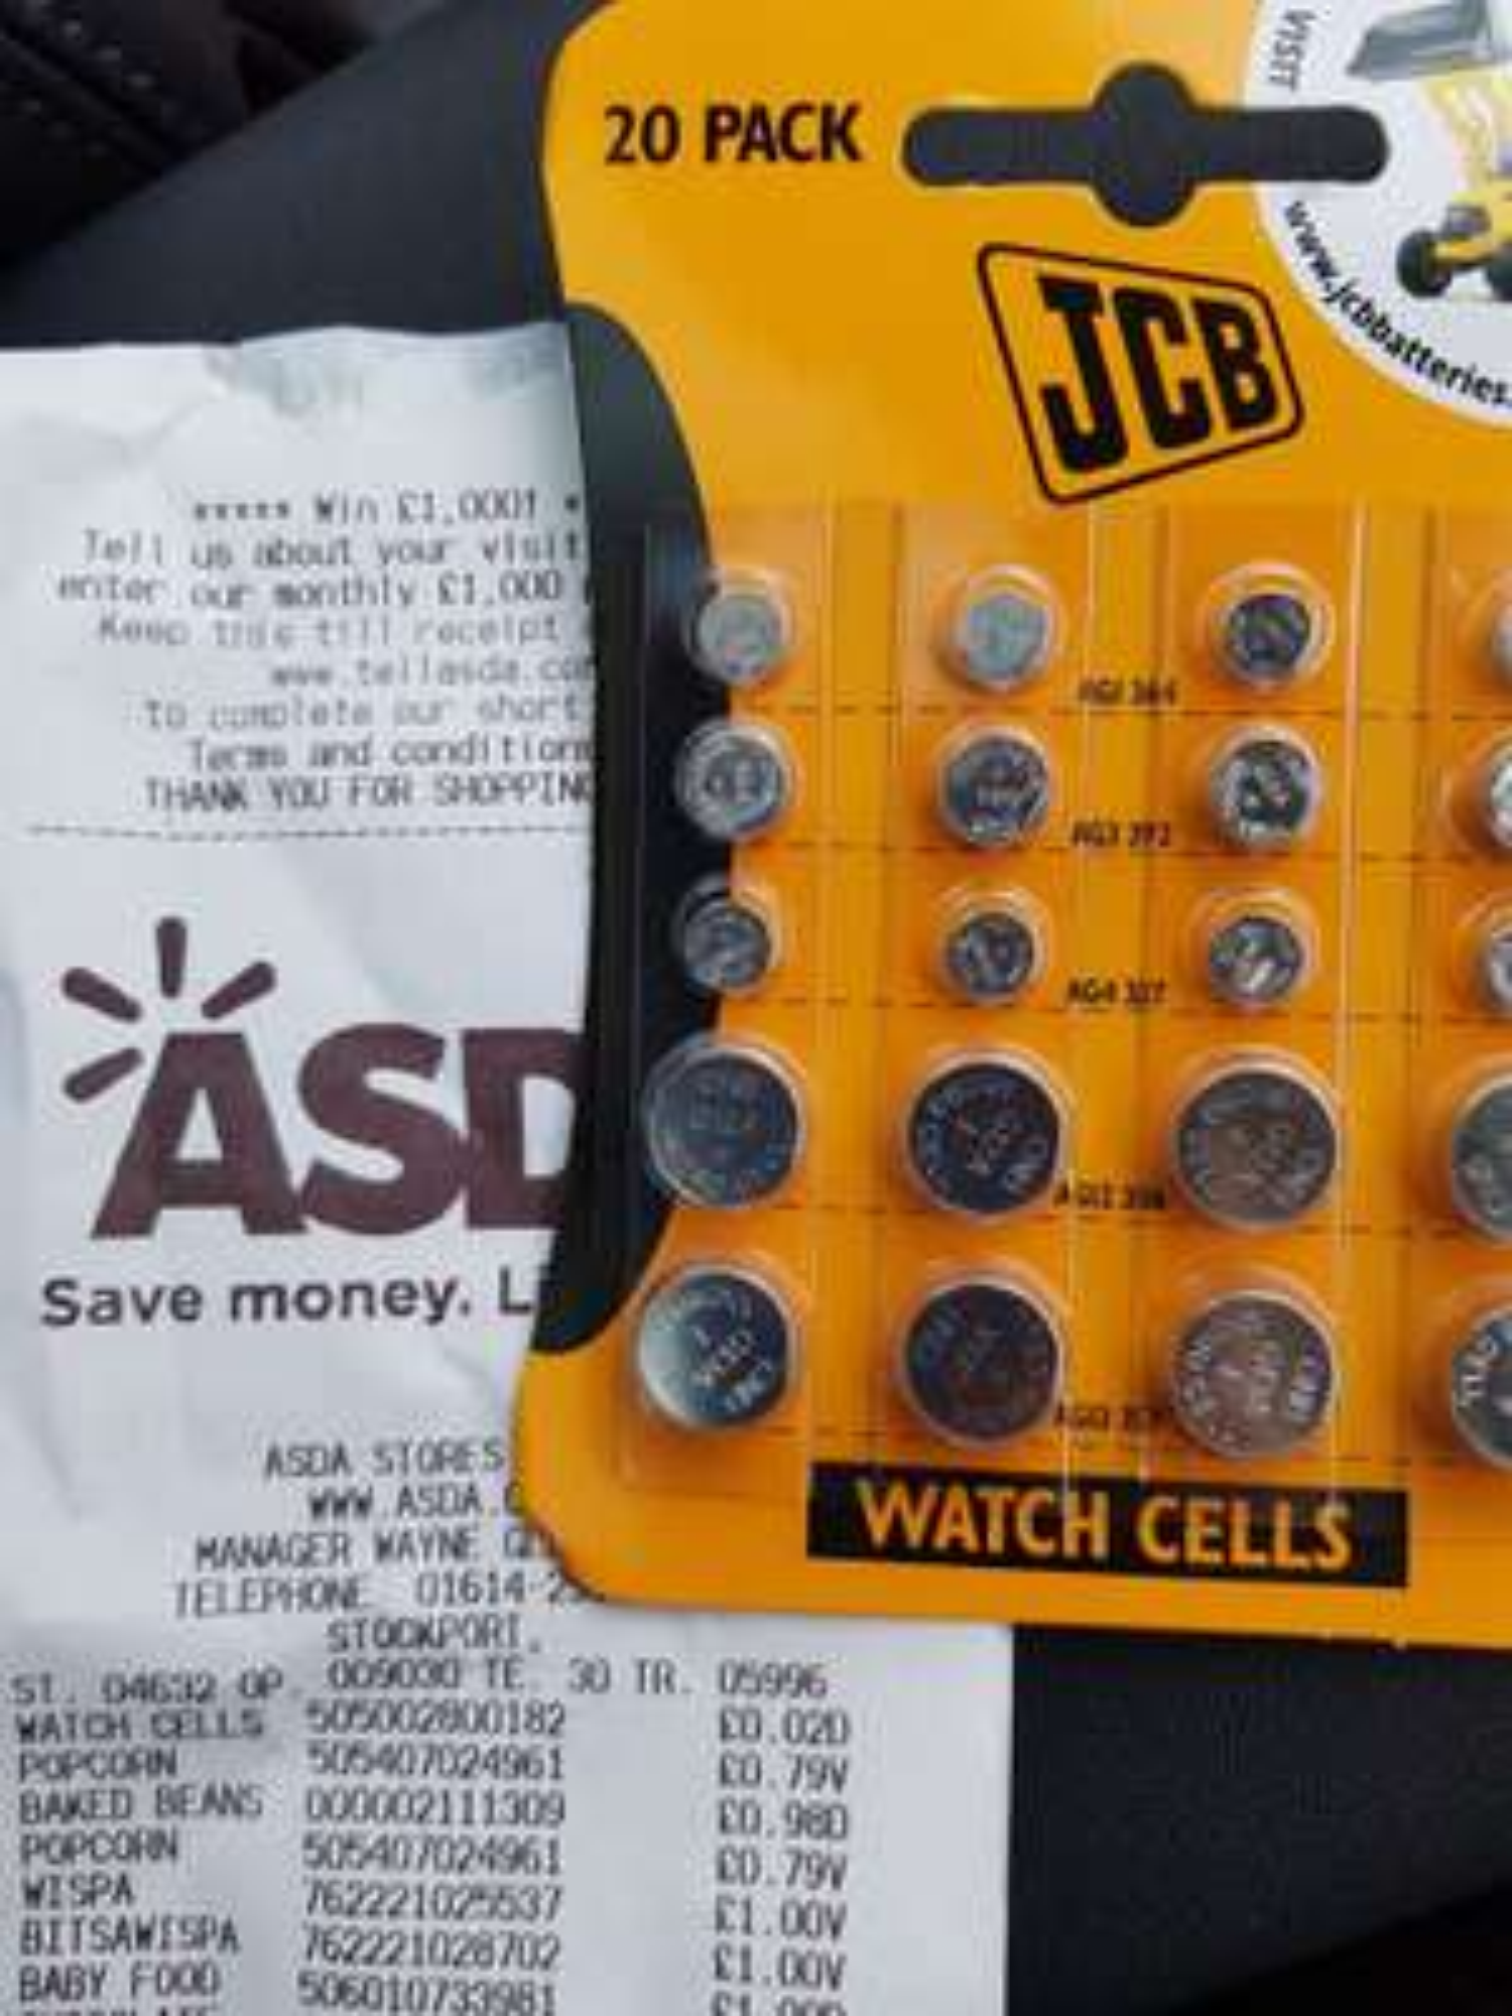 Asda stockport JCB watch batteries £4.50 scanning @ 0.02